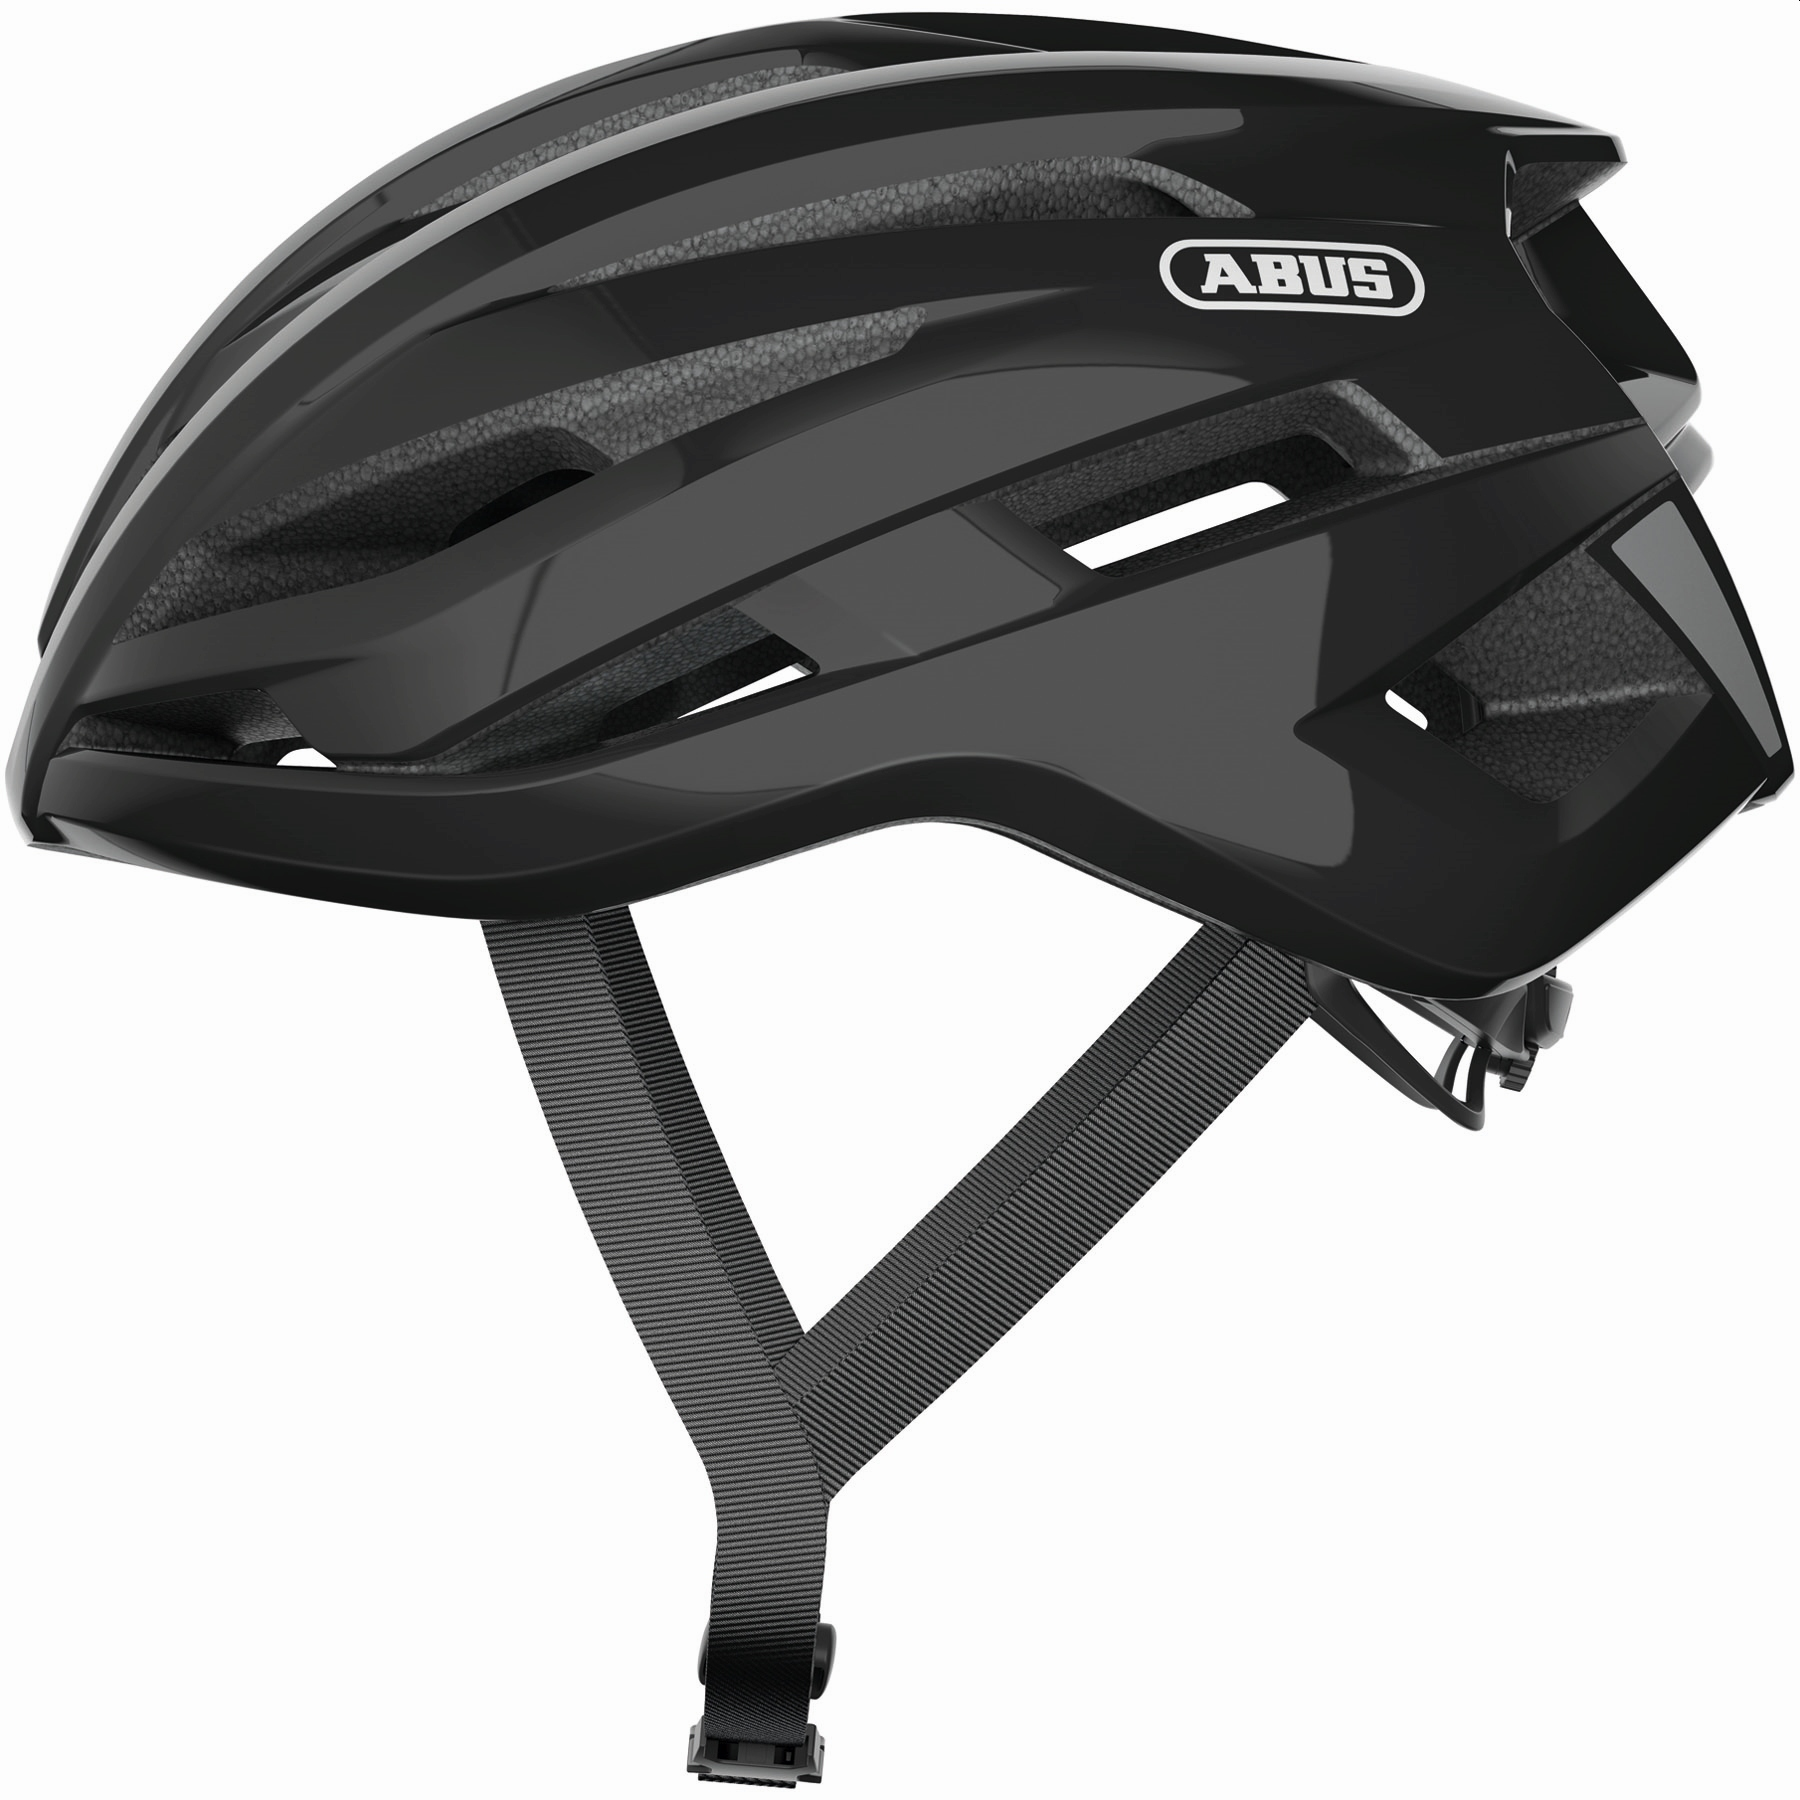 ABUS StormChaser Casco Carretera - shiny black